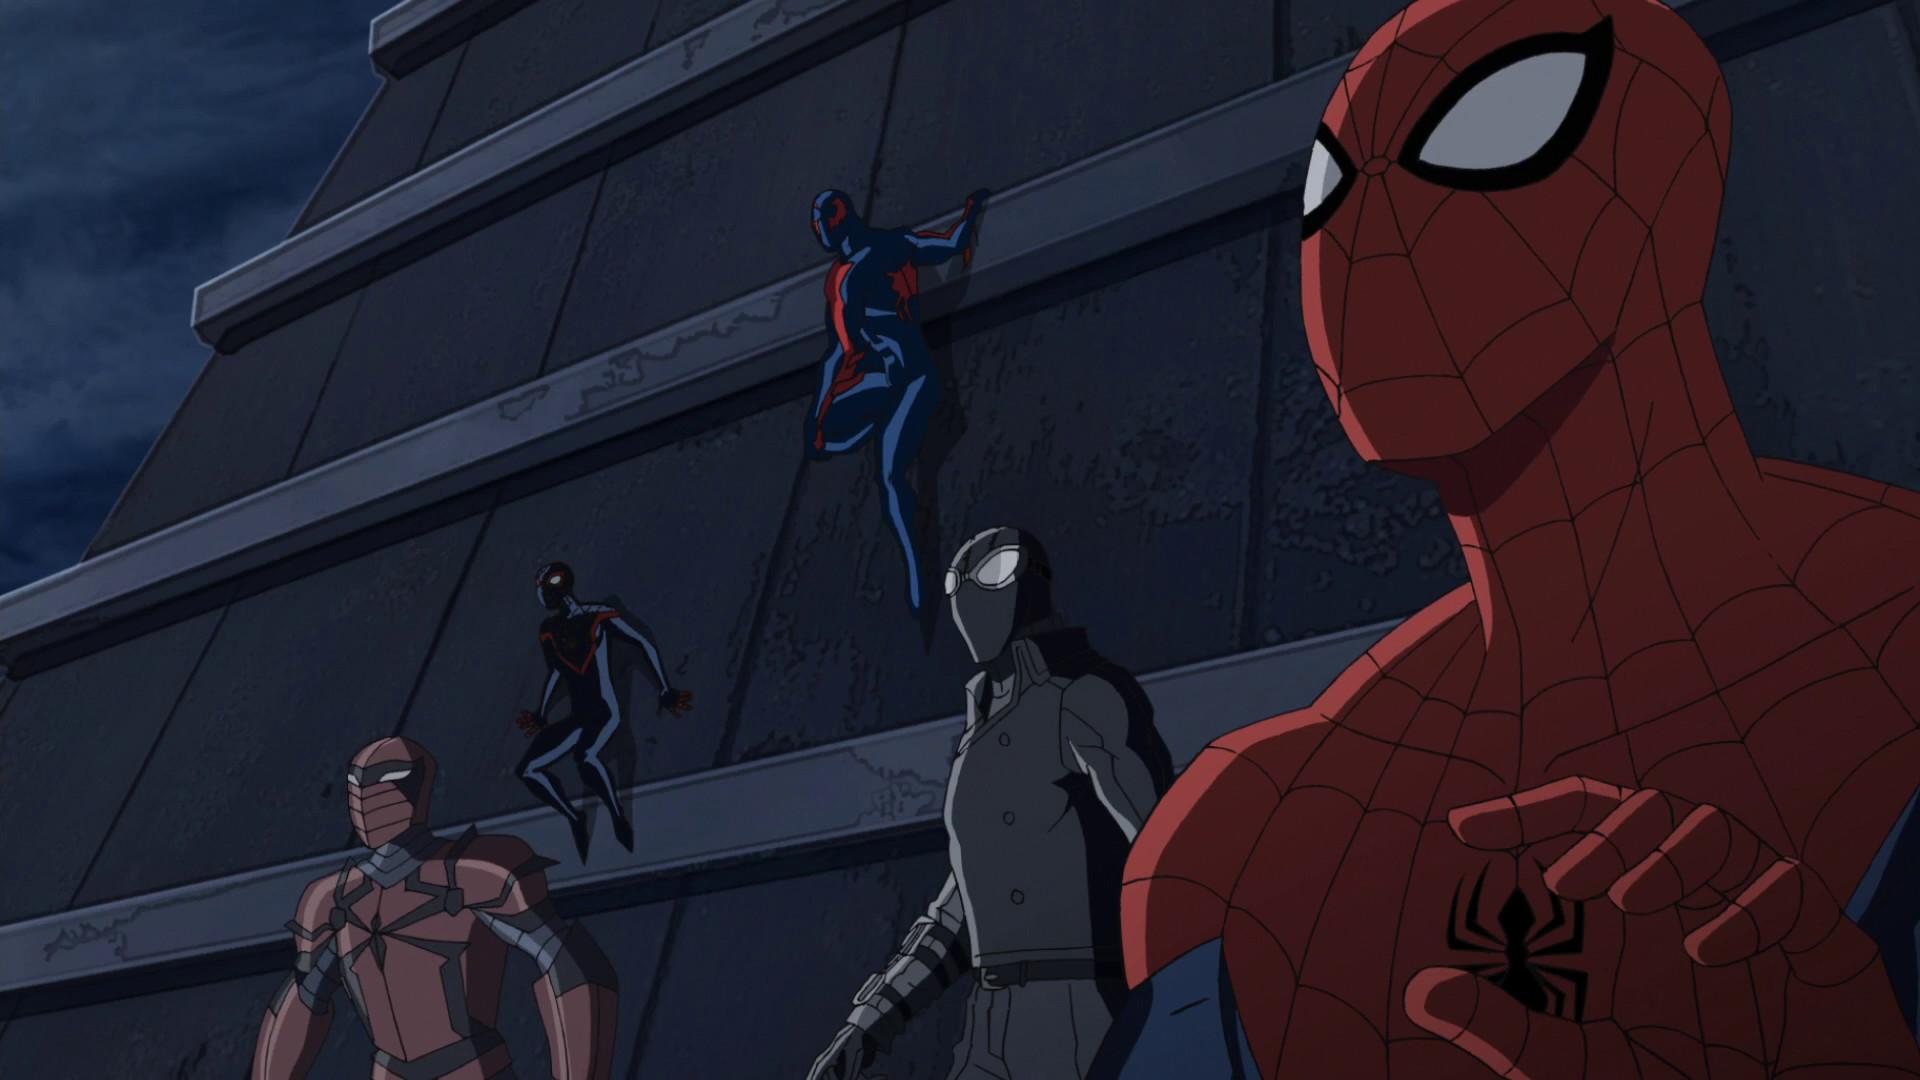 Spyder Knight, Ultimate Spider-Men, Spider-Man 2099, and Spider-Man Noir |  Spider-Man | Pinterest | Ultimate spider man, Spider-Man and Spider